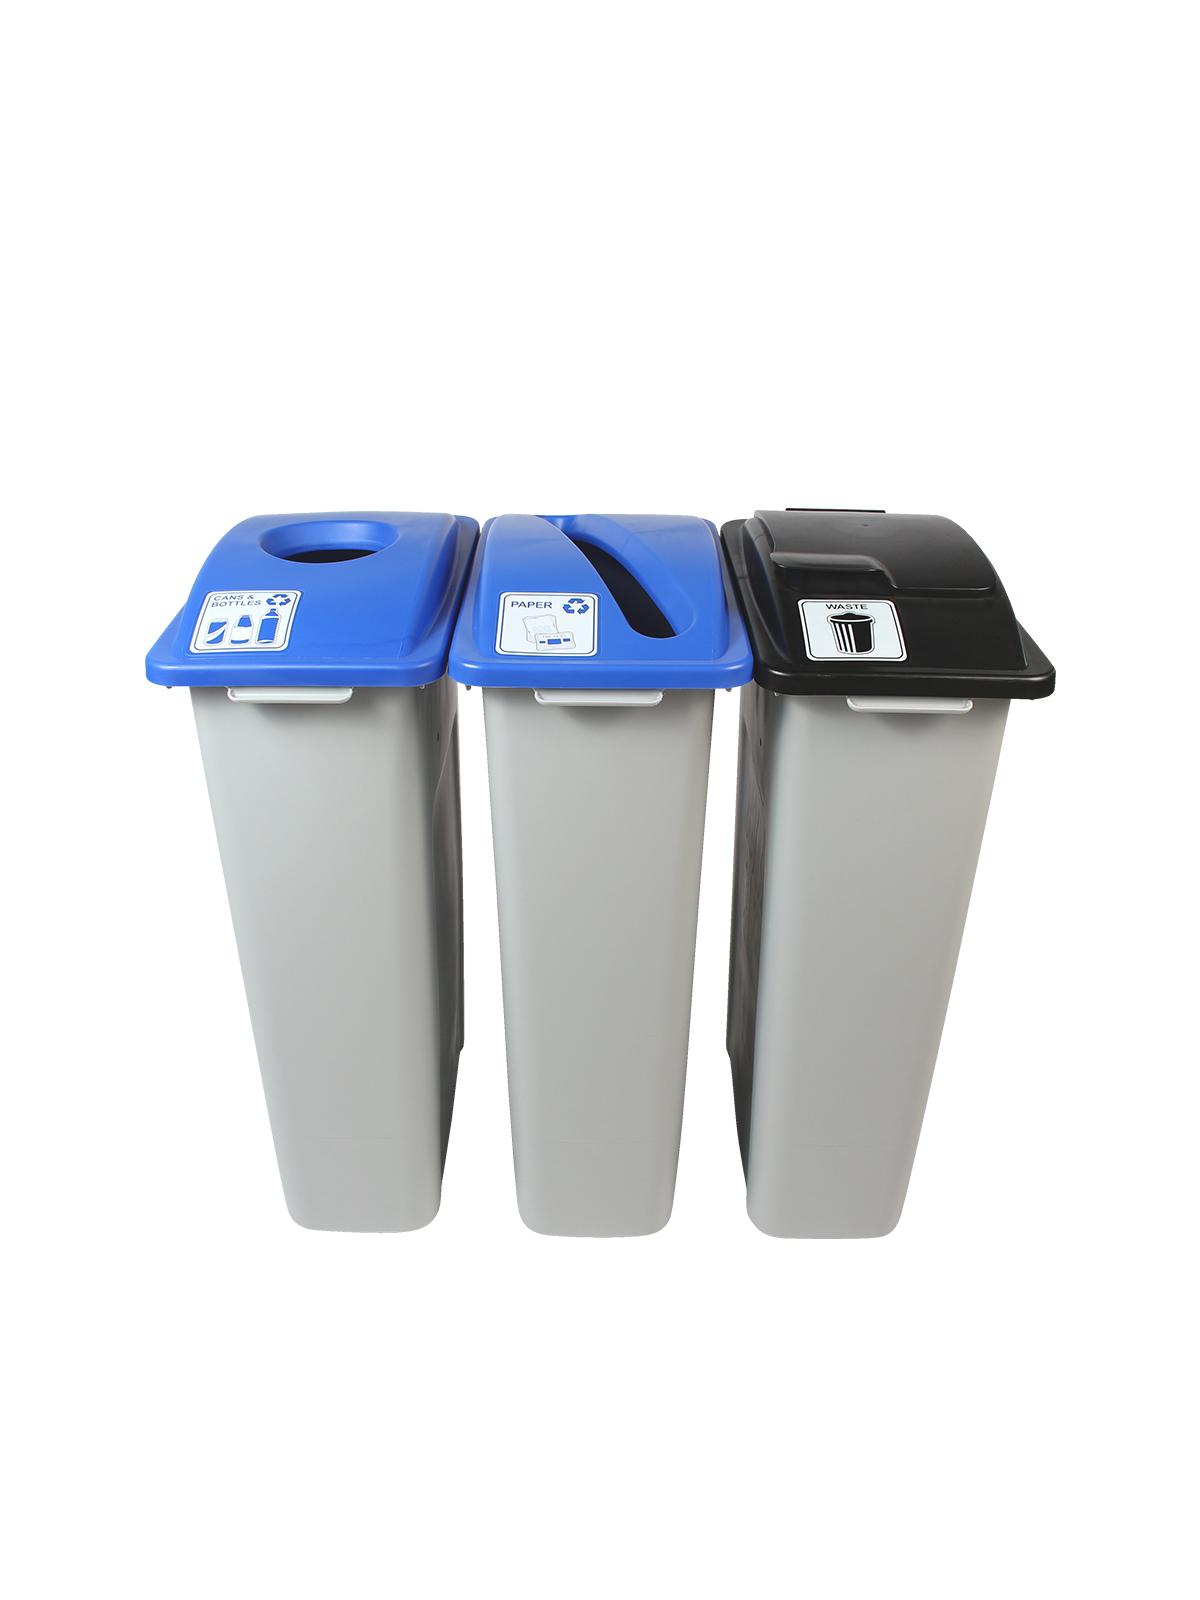 WASTE WATCHER - Triple - Cans & Bottles-Paper-Waste - Circle-Slot-Solid Lift - Grey-Blue-Blue-Black